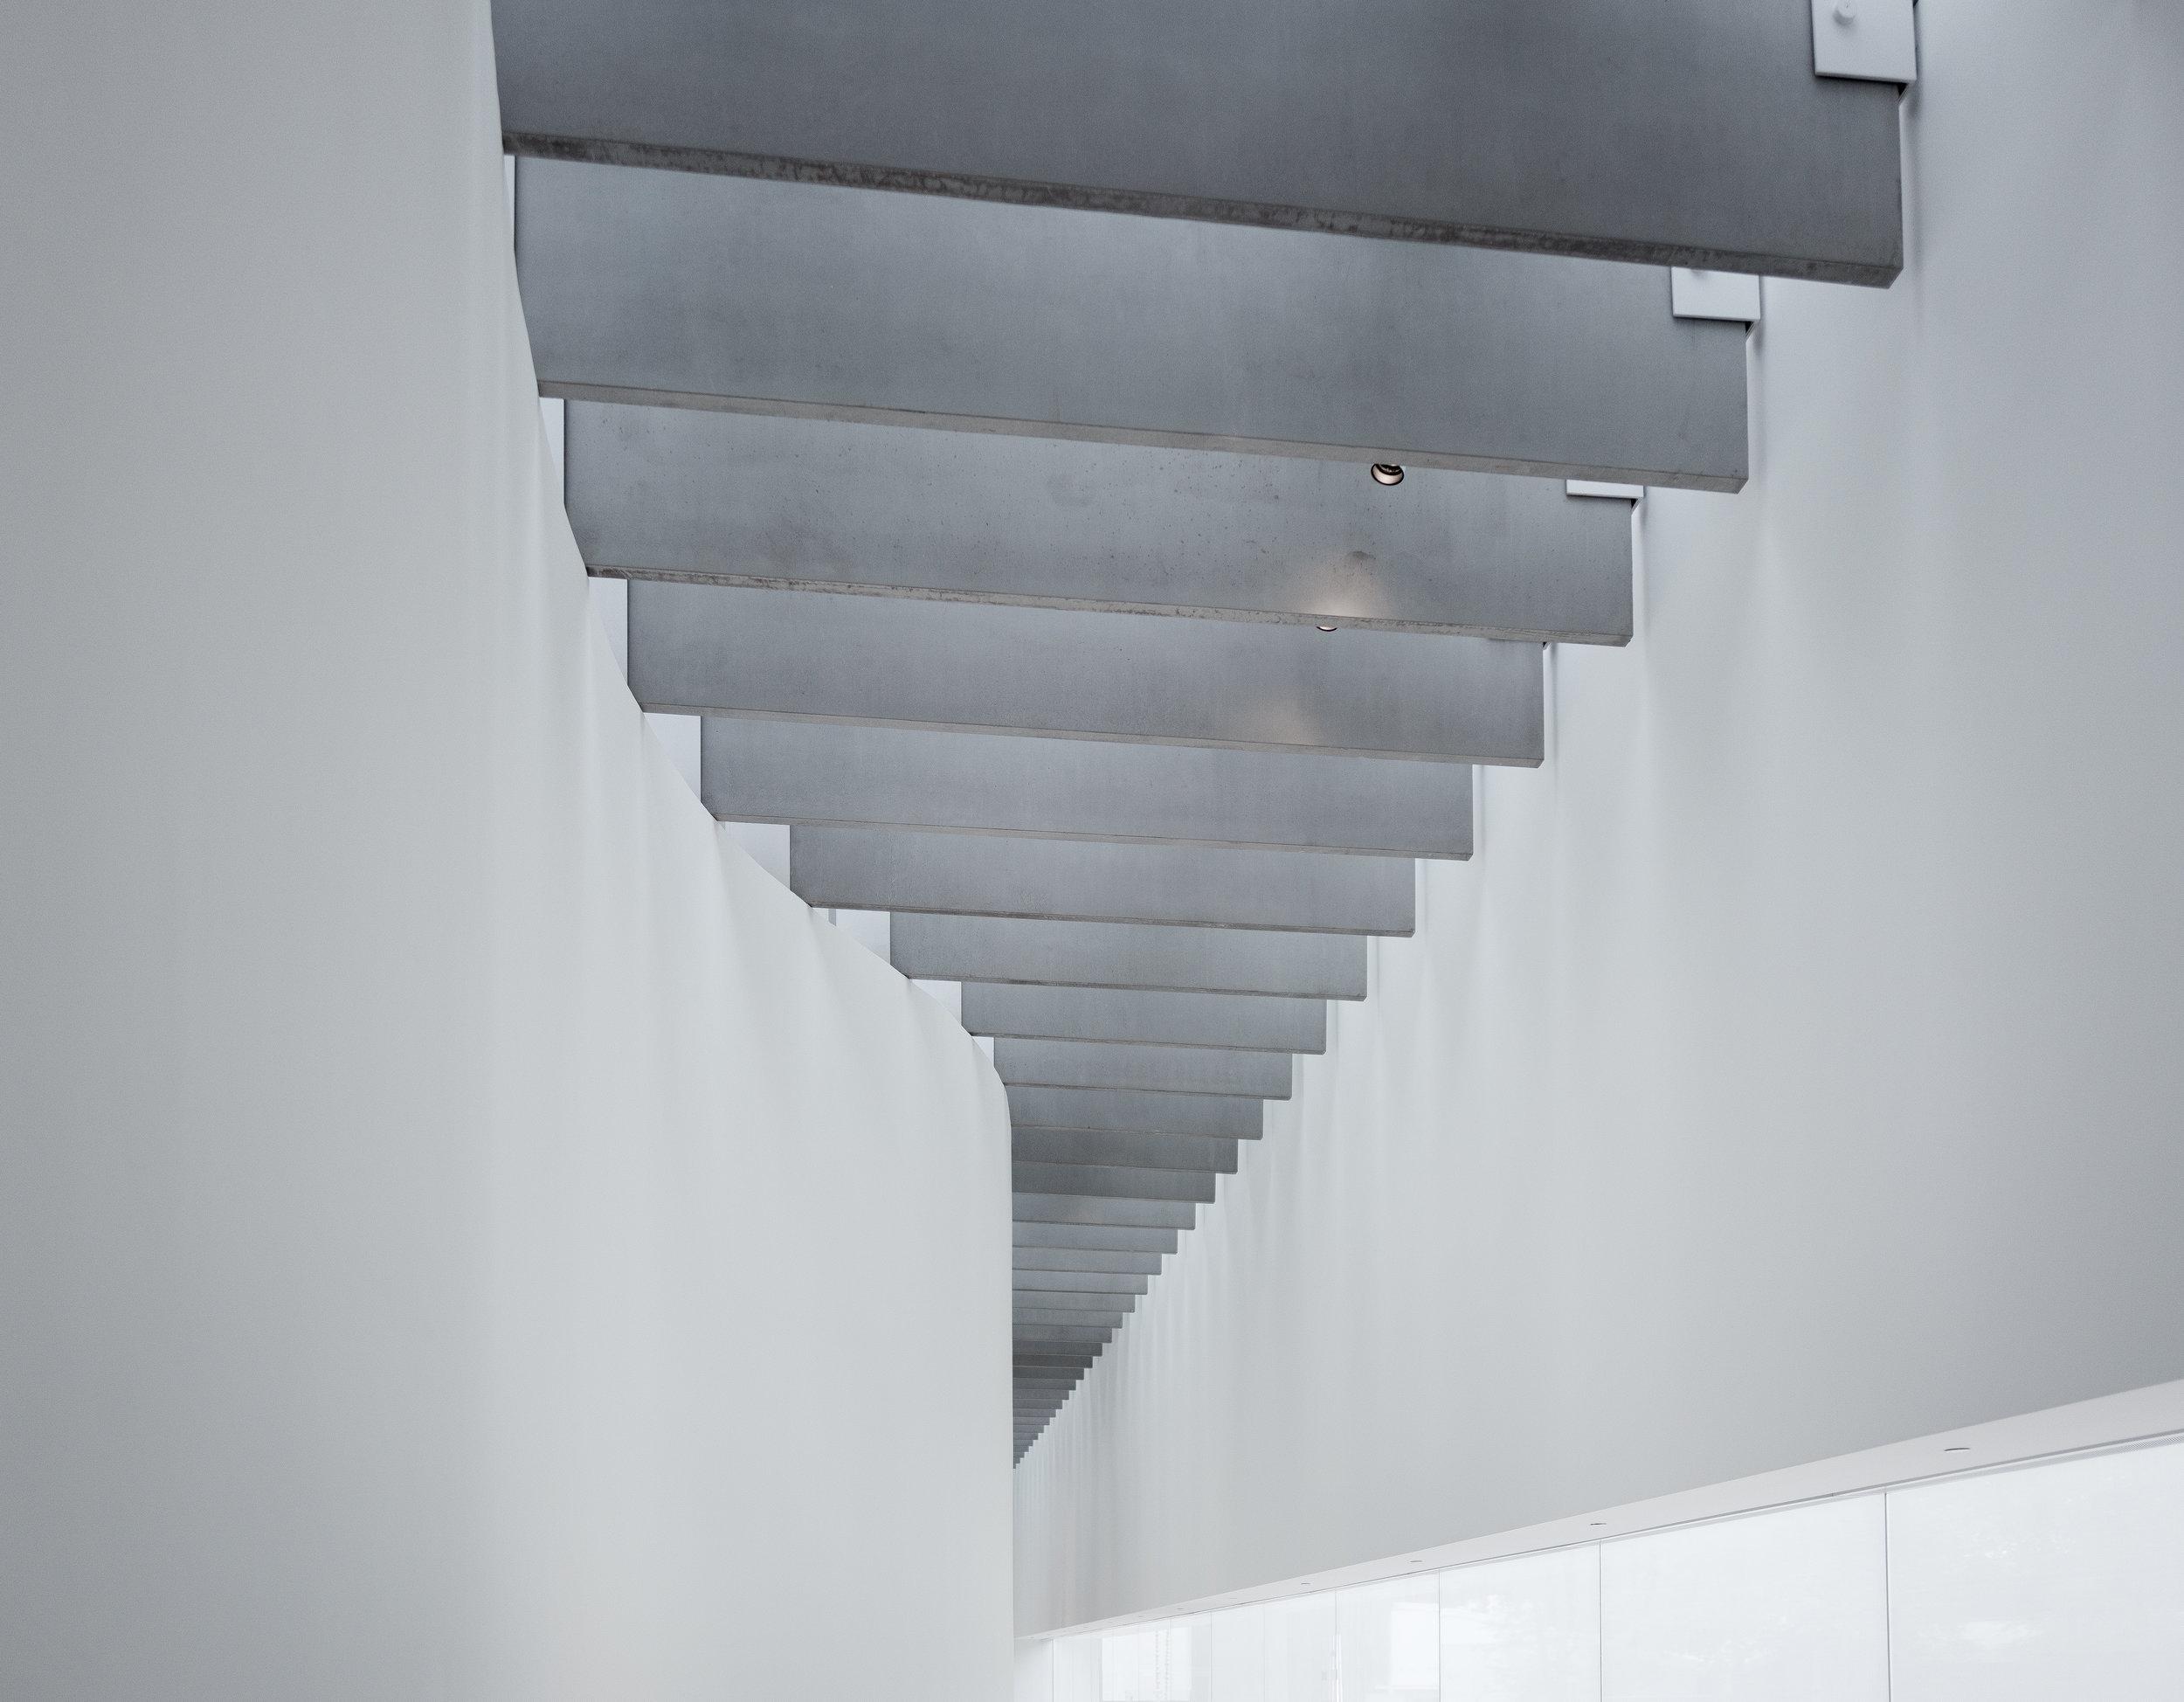 ramsey bakhoum - architectural photographer - corning museum (1 of 1)-18.jpg